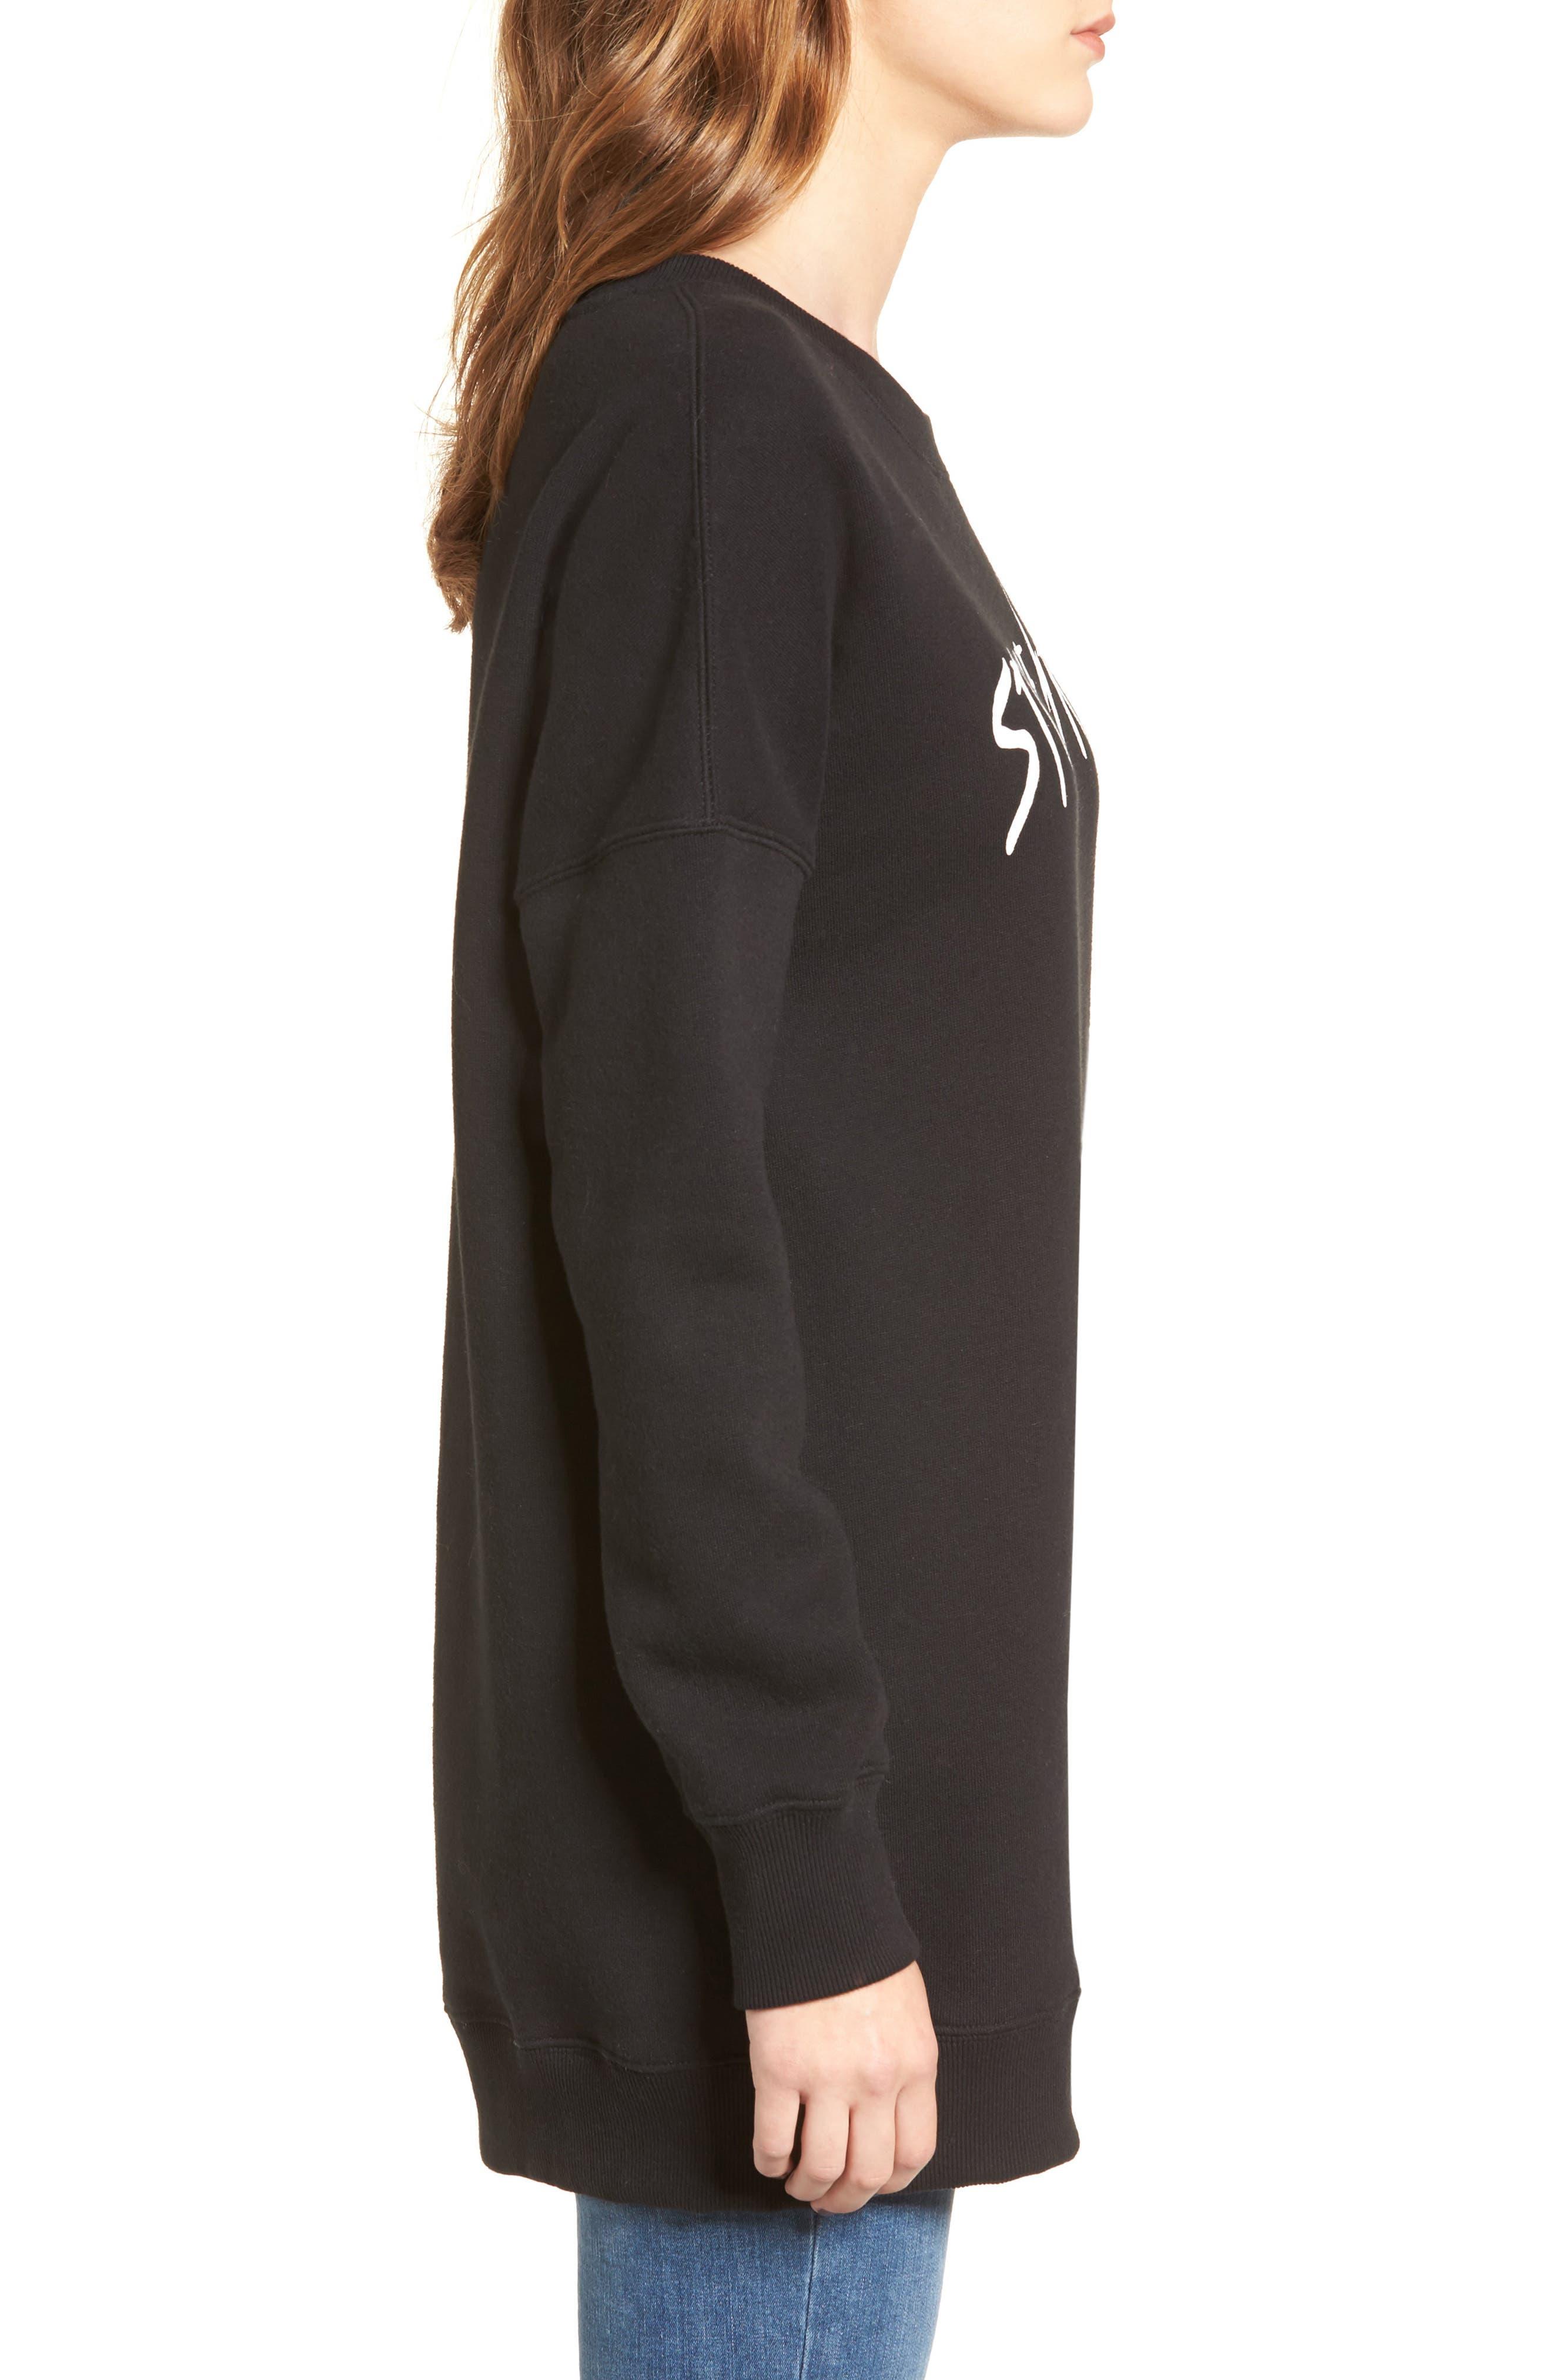 Me Too Sweatshirt,                             Alternate thumbnail 3, color,                             Black